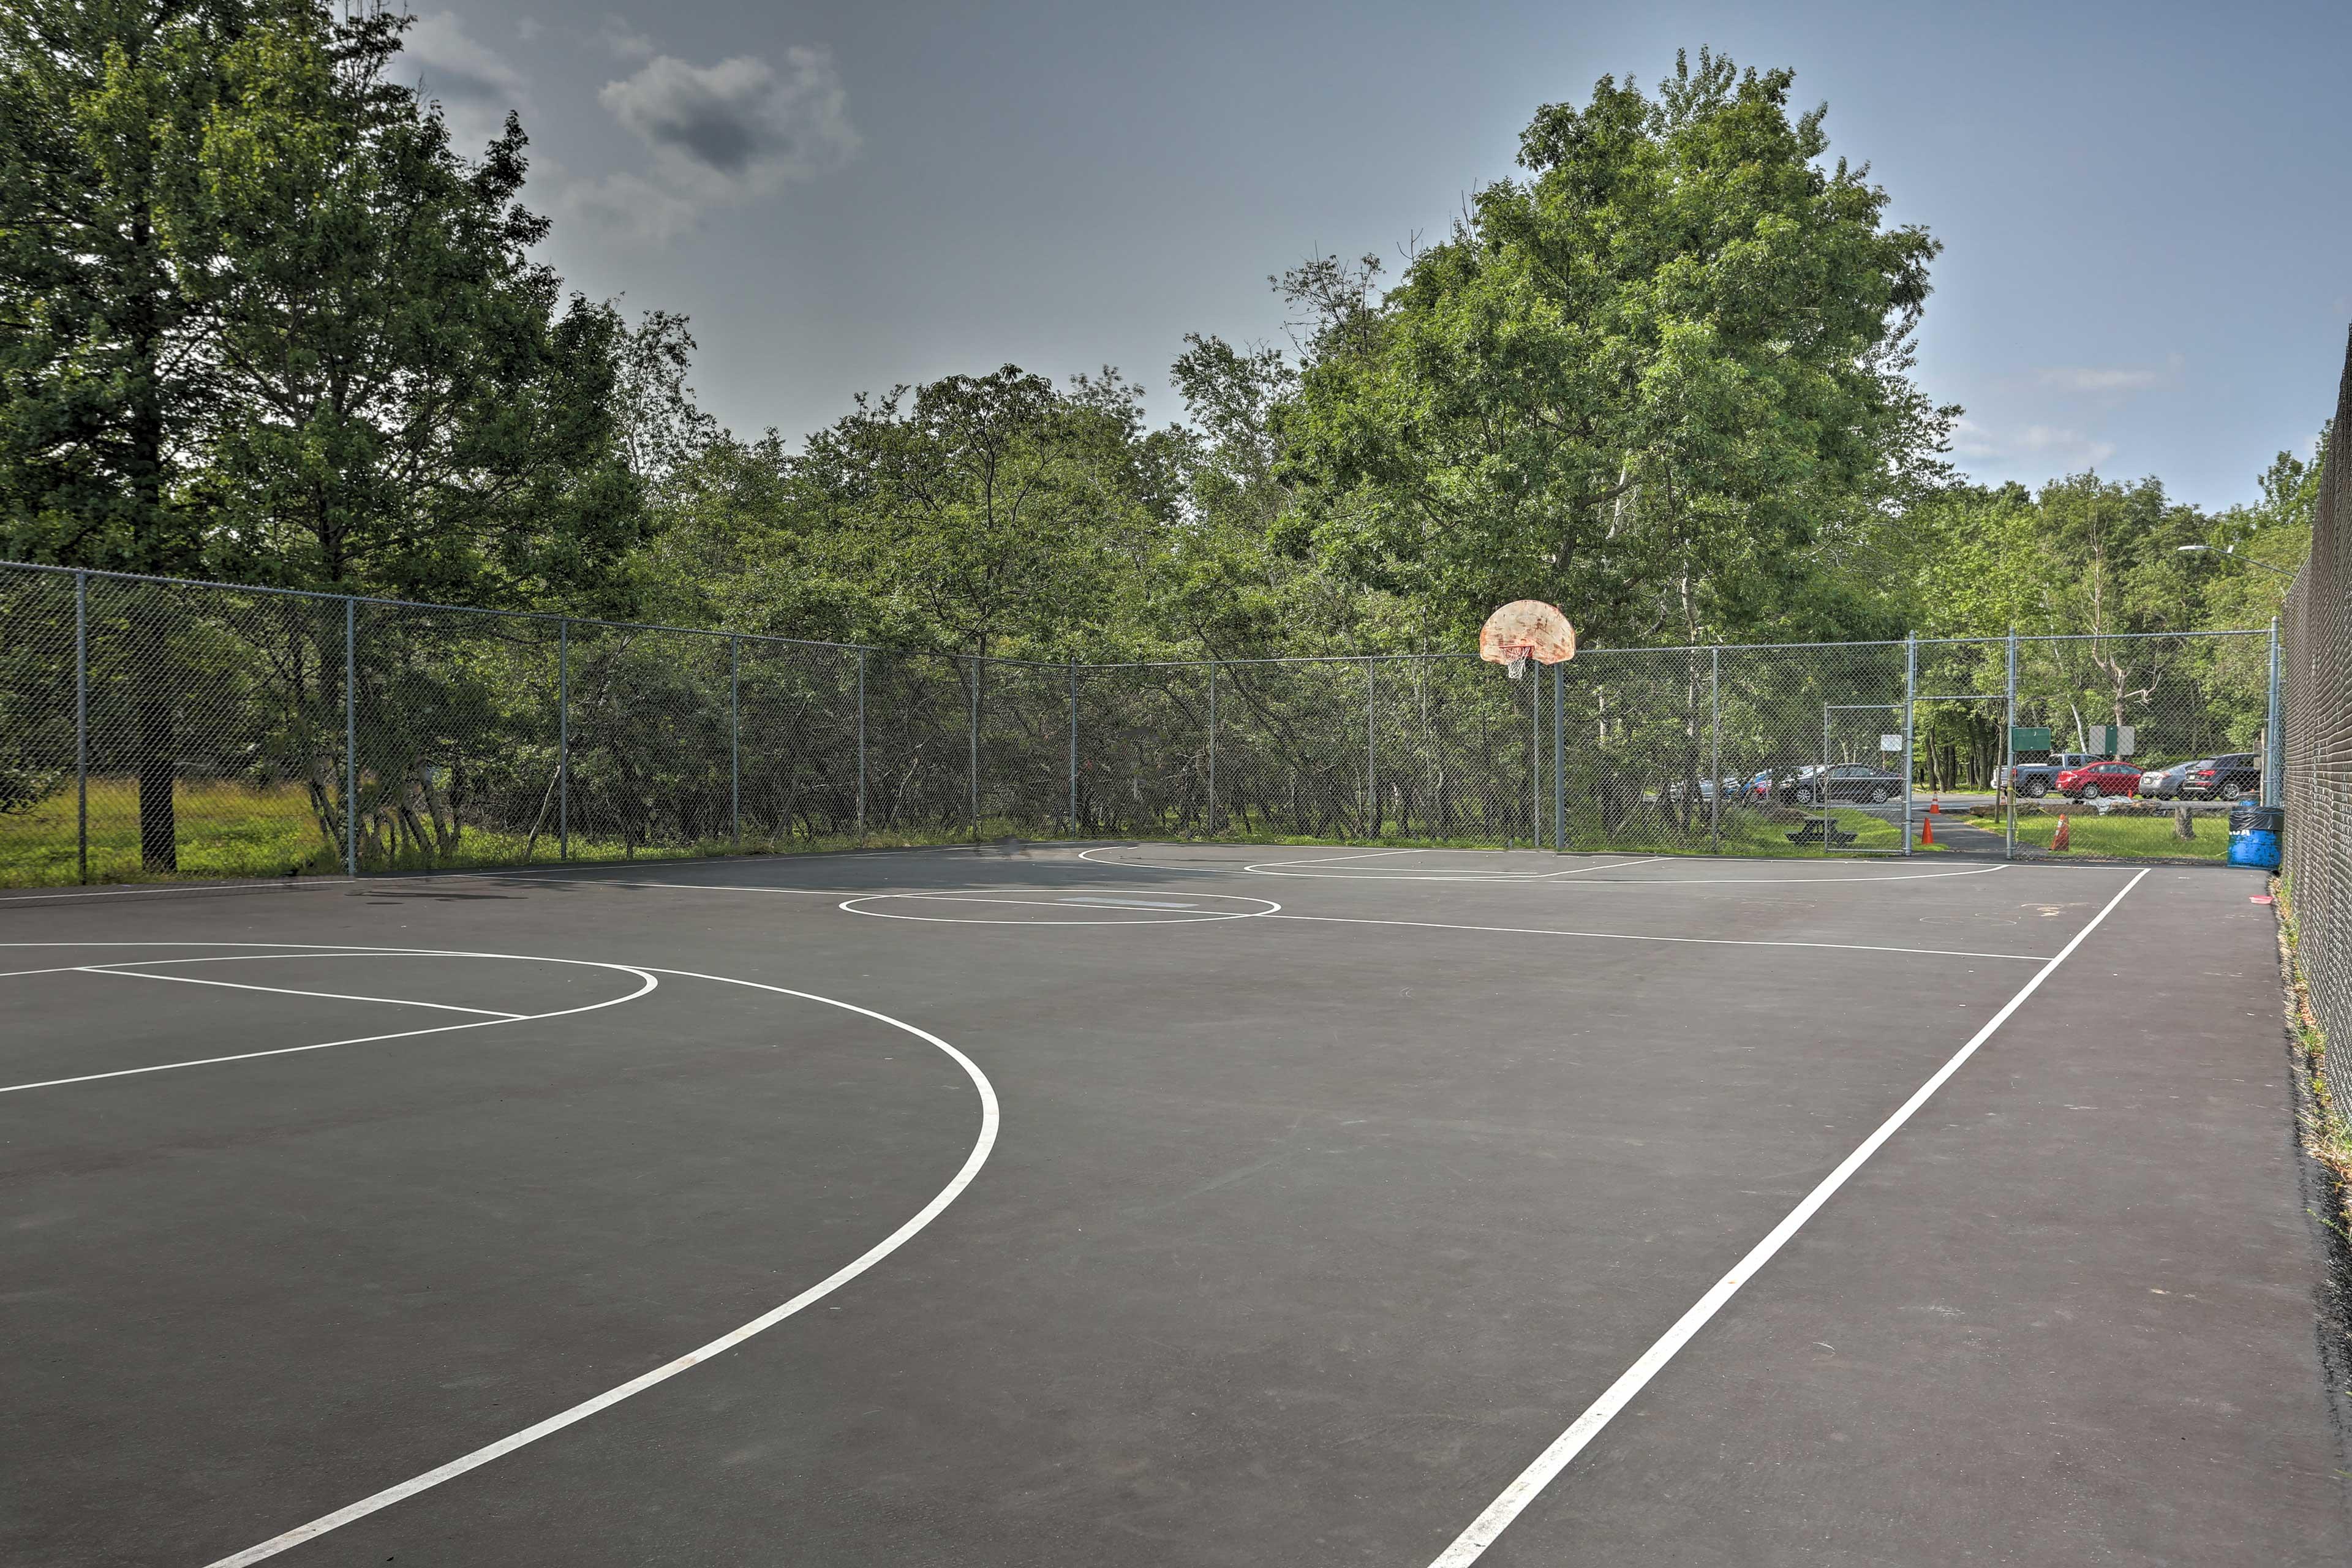 Enjoy a fun workout at the basketball court.